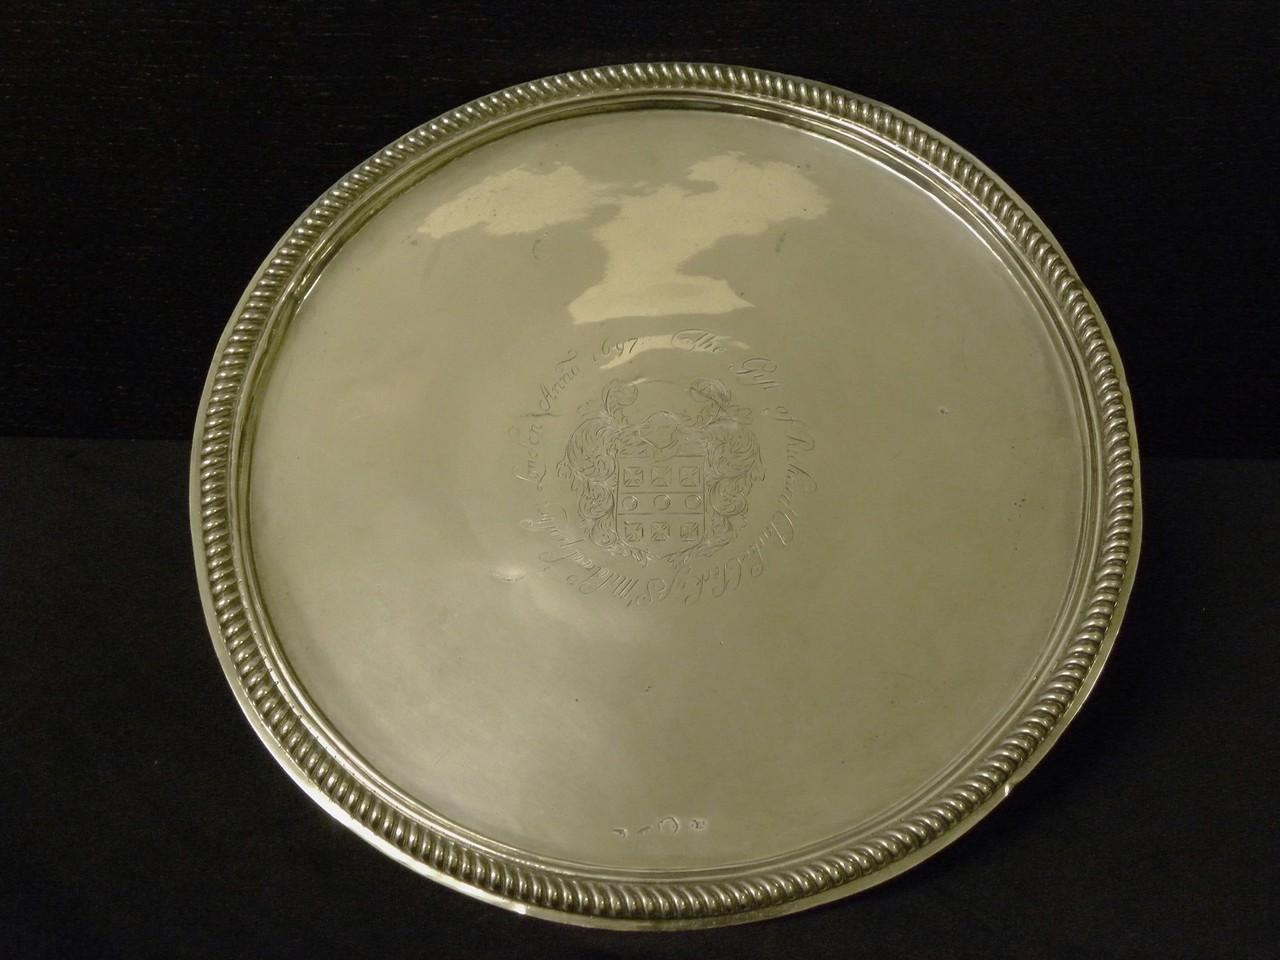 1 Salver 1681 gift of Richard Clarke 1697